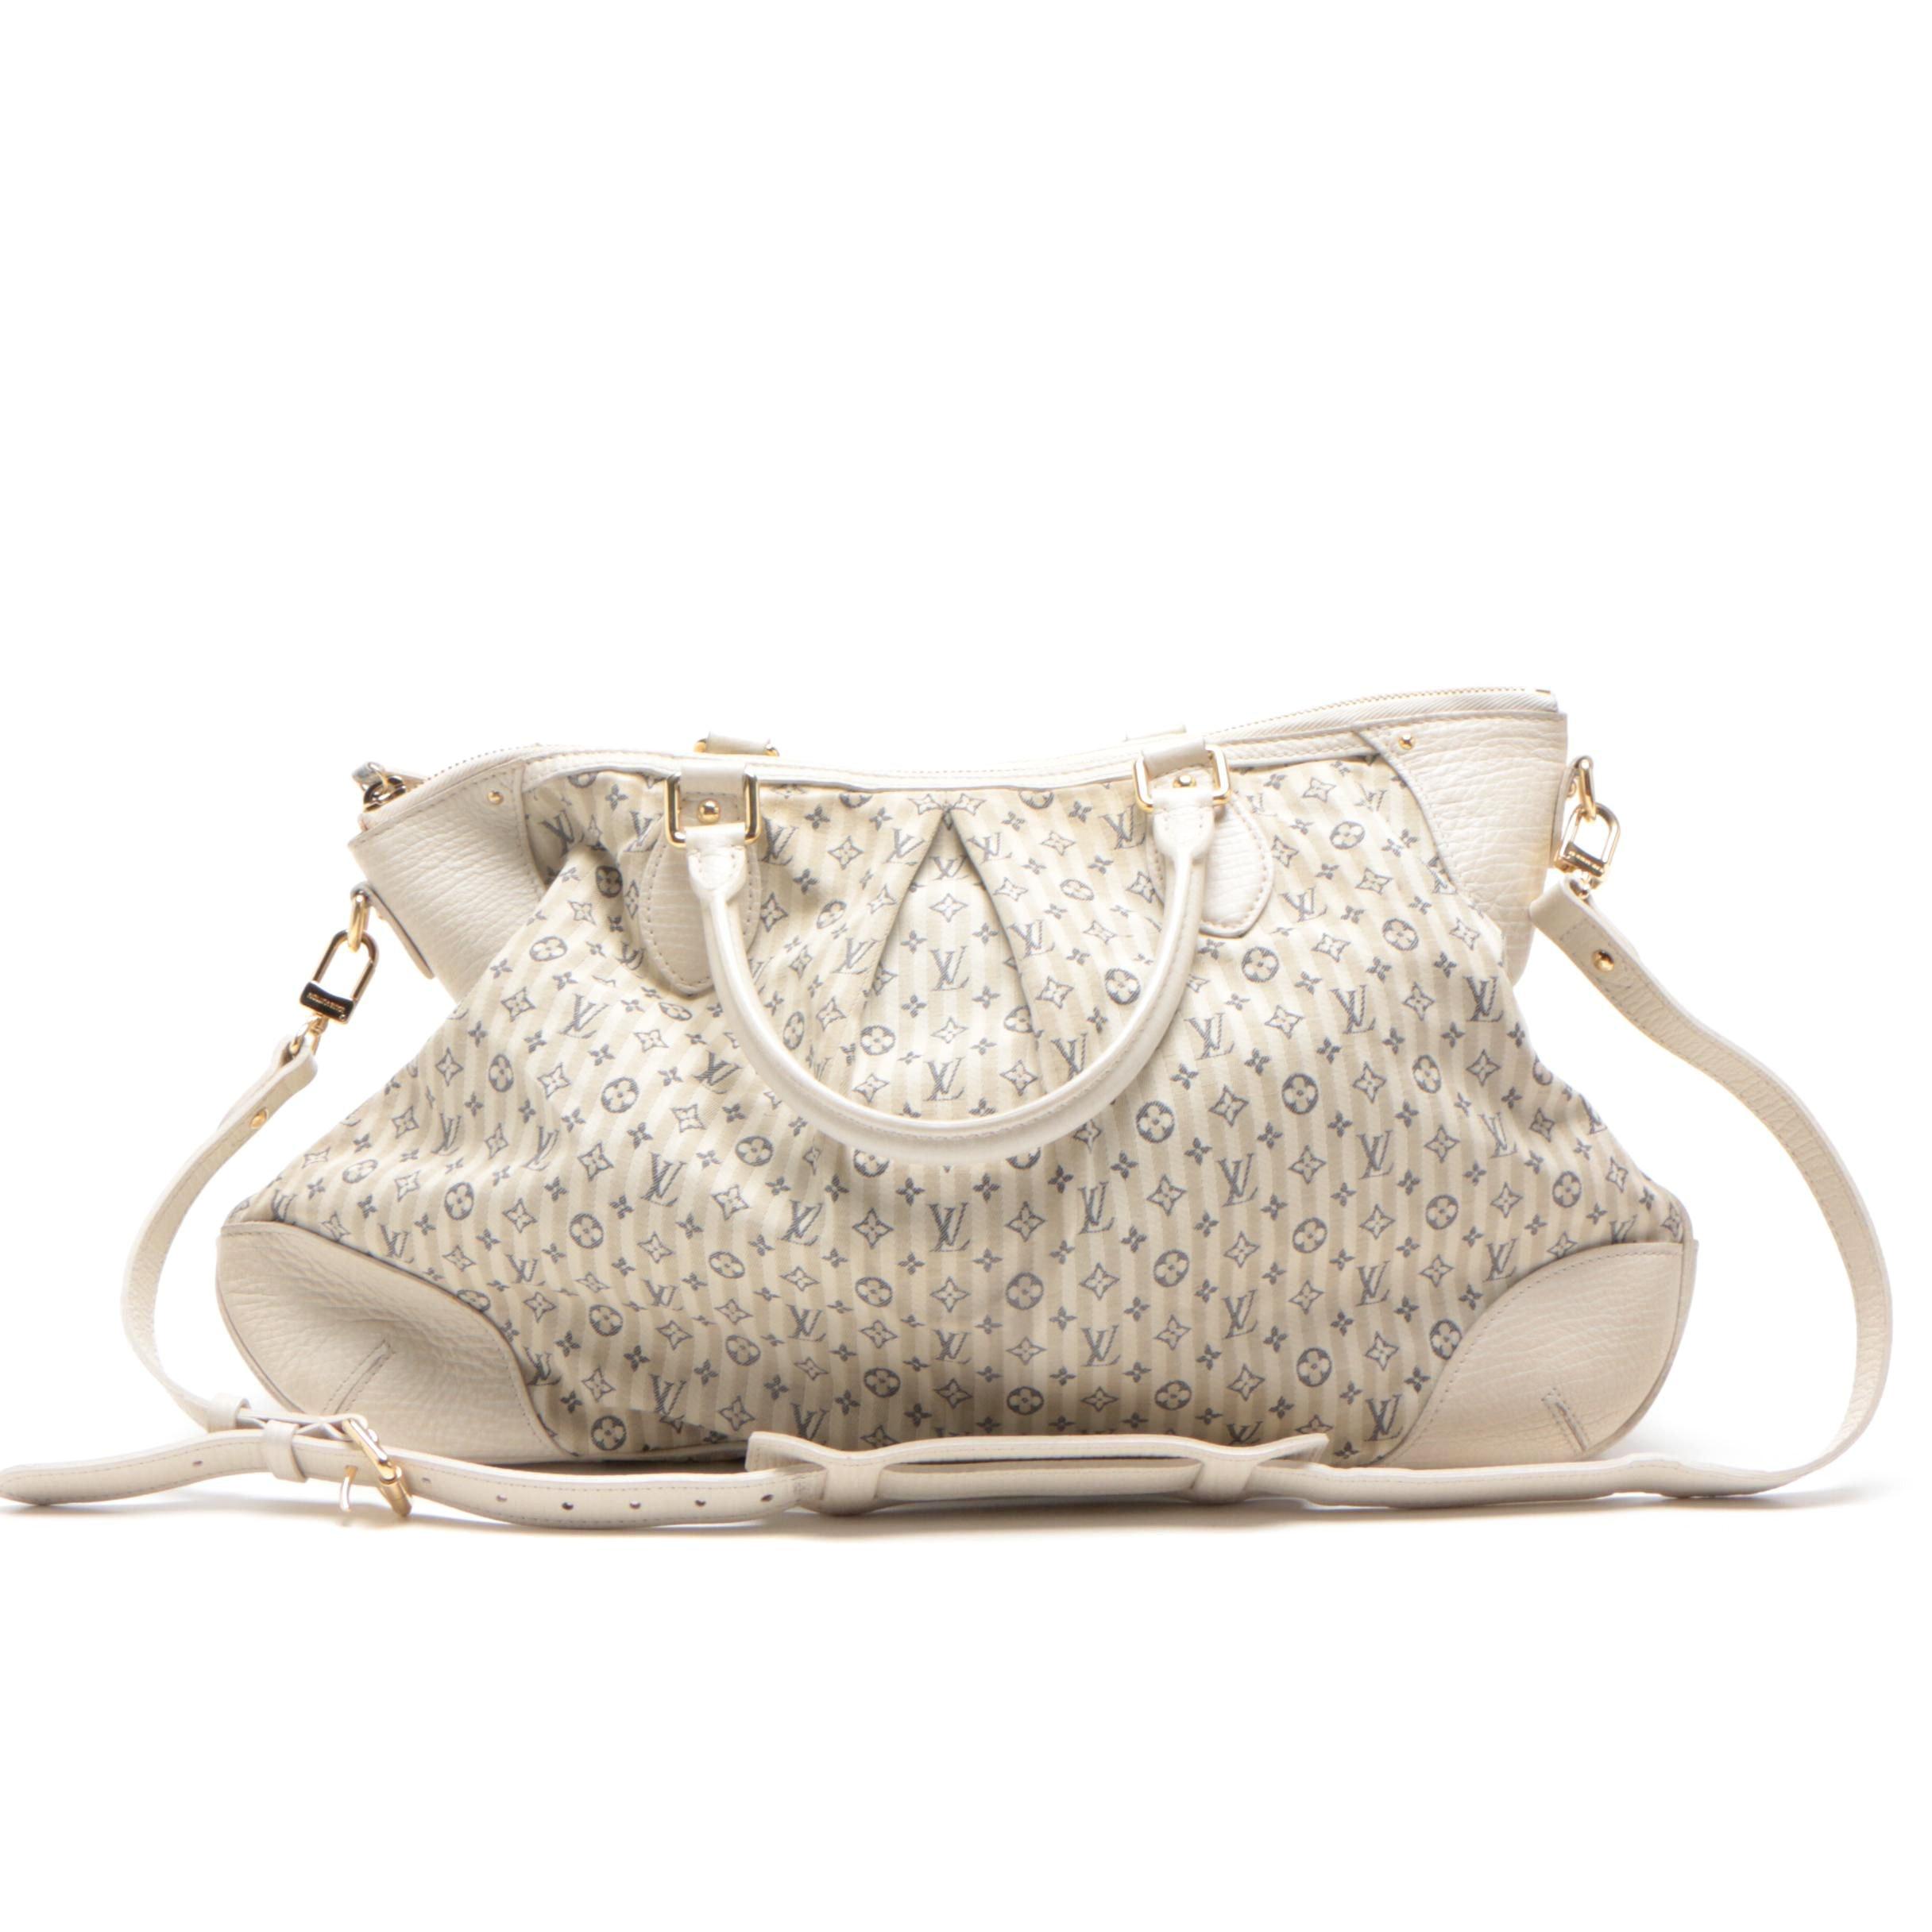 Louis Vuitton White and Blue Monogram Mini Lin Croisette Marina GM Bag